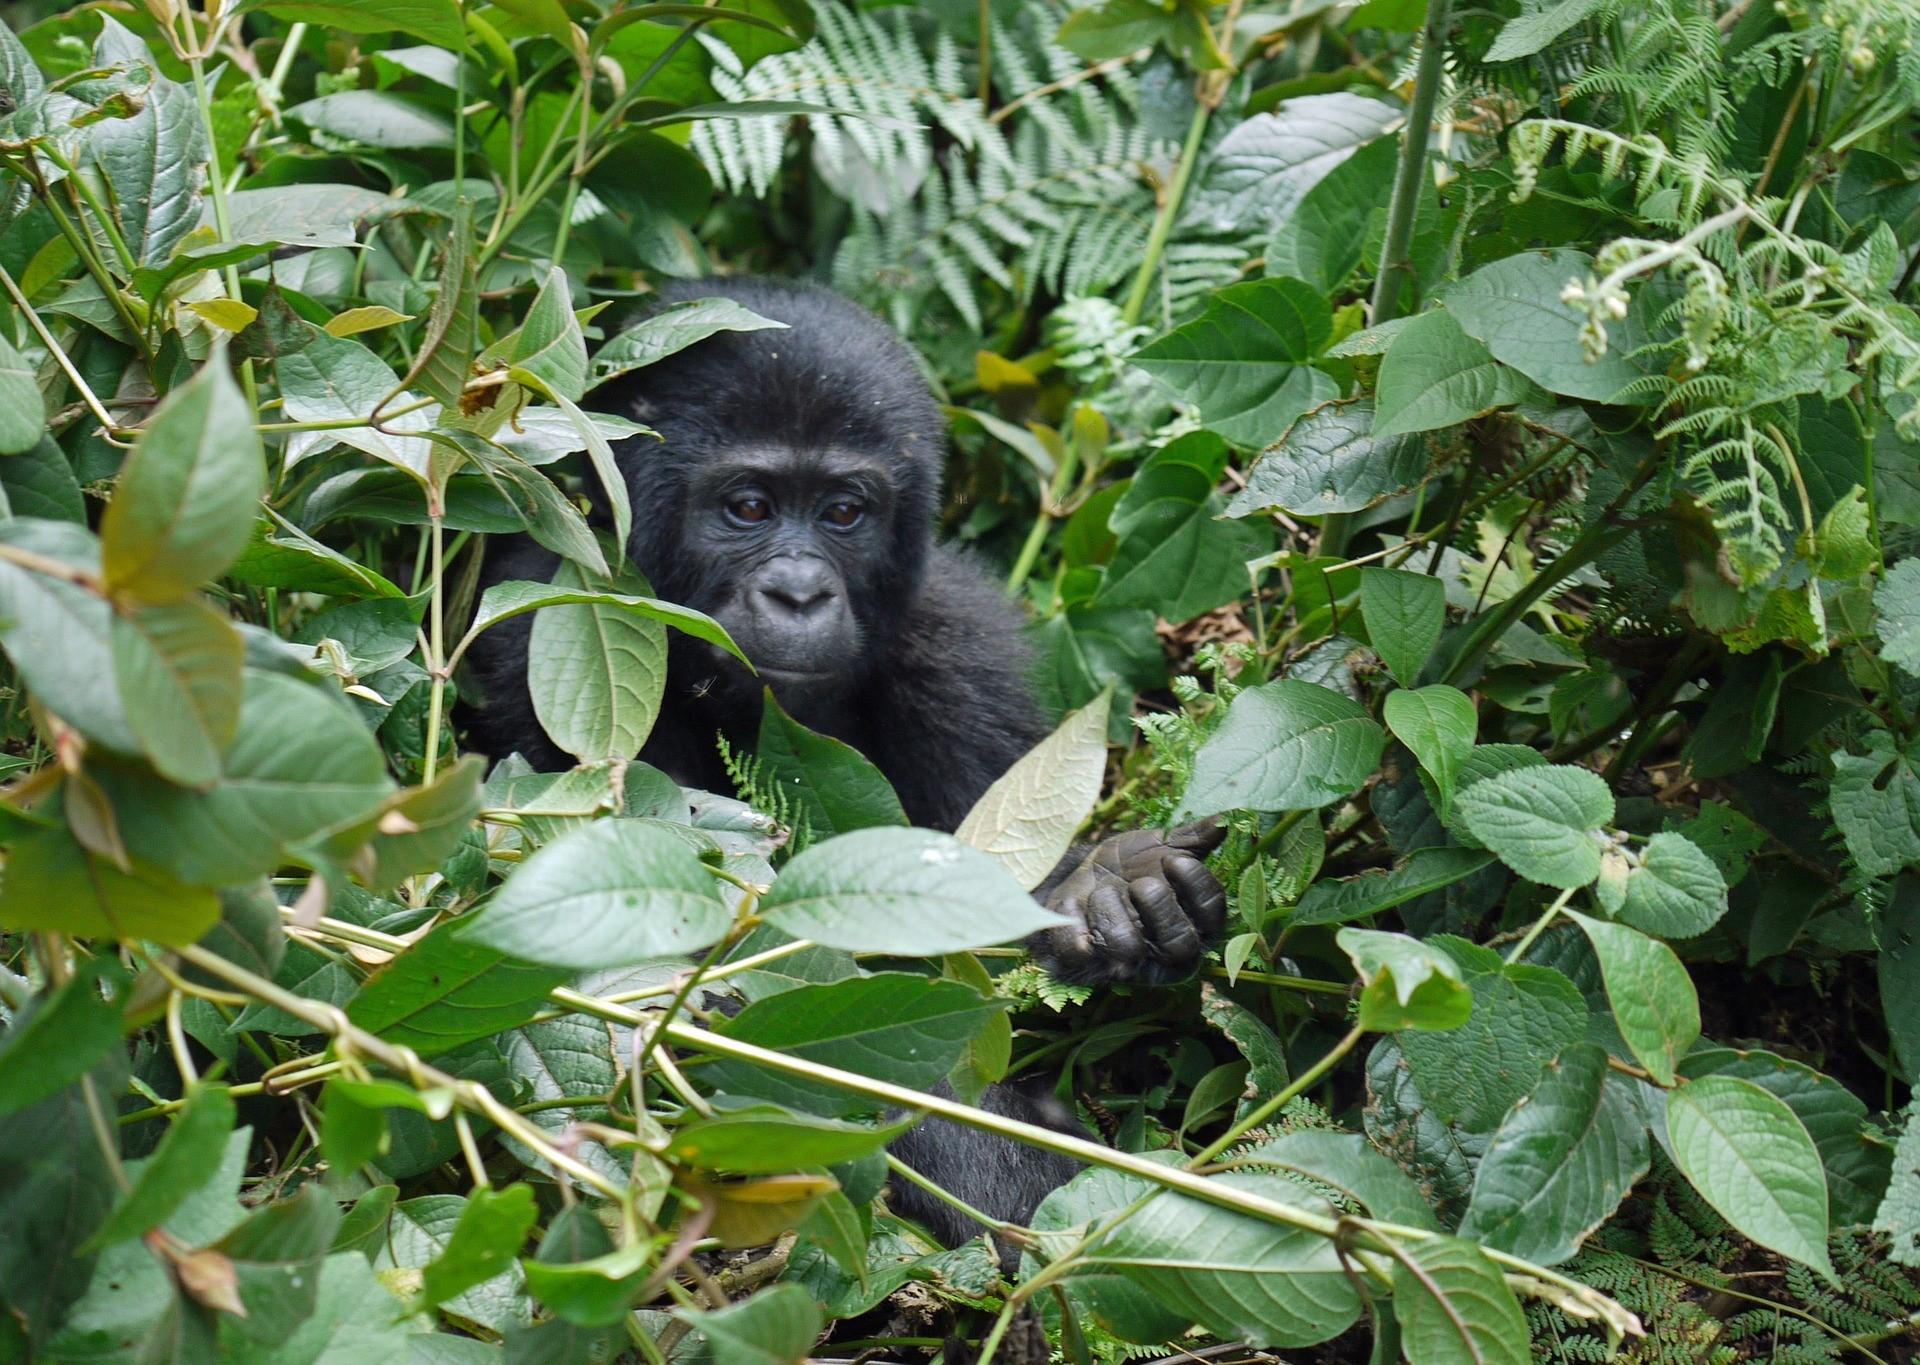 14-daagse rondreis Oeganda 'Kabaka Gorilla'